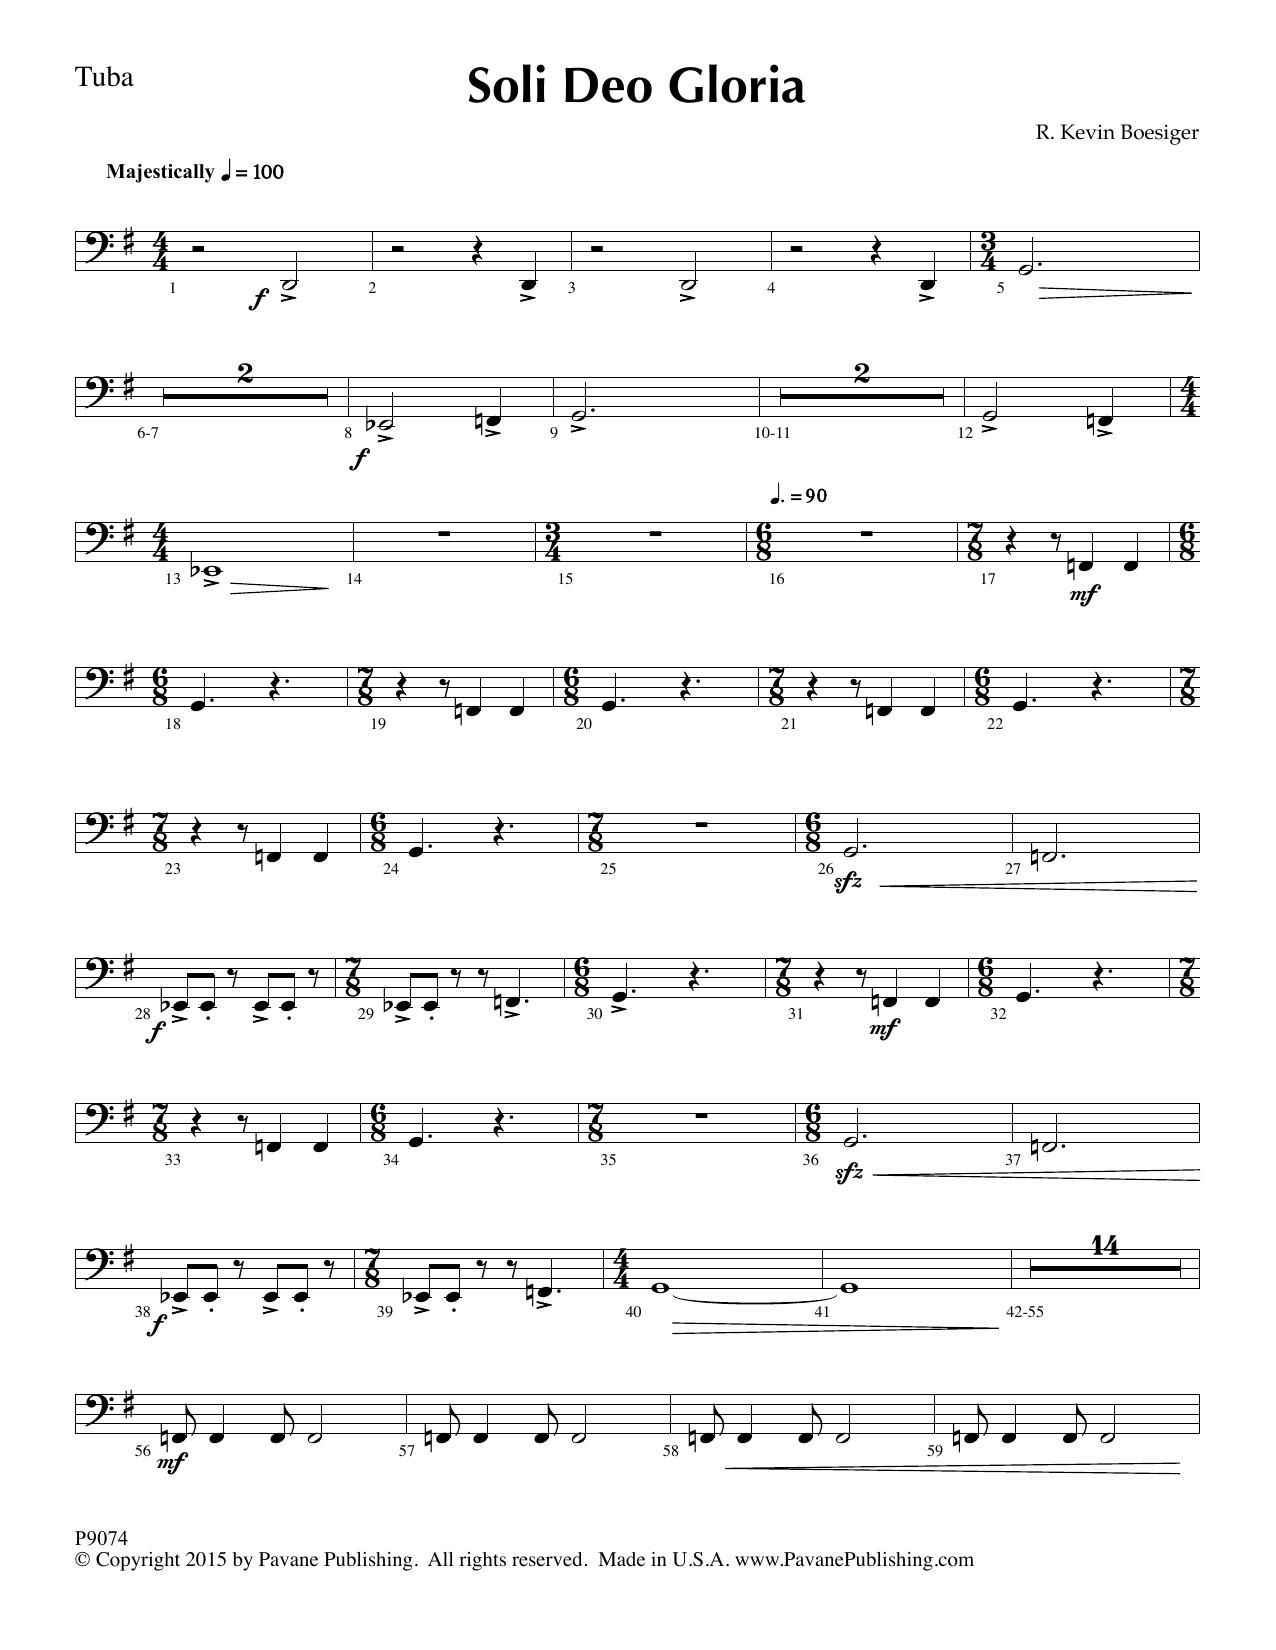 Soli Deo Gloria - Tuba Partition Digitale